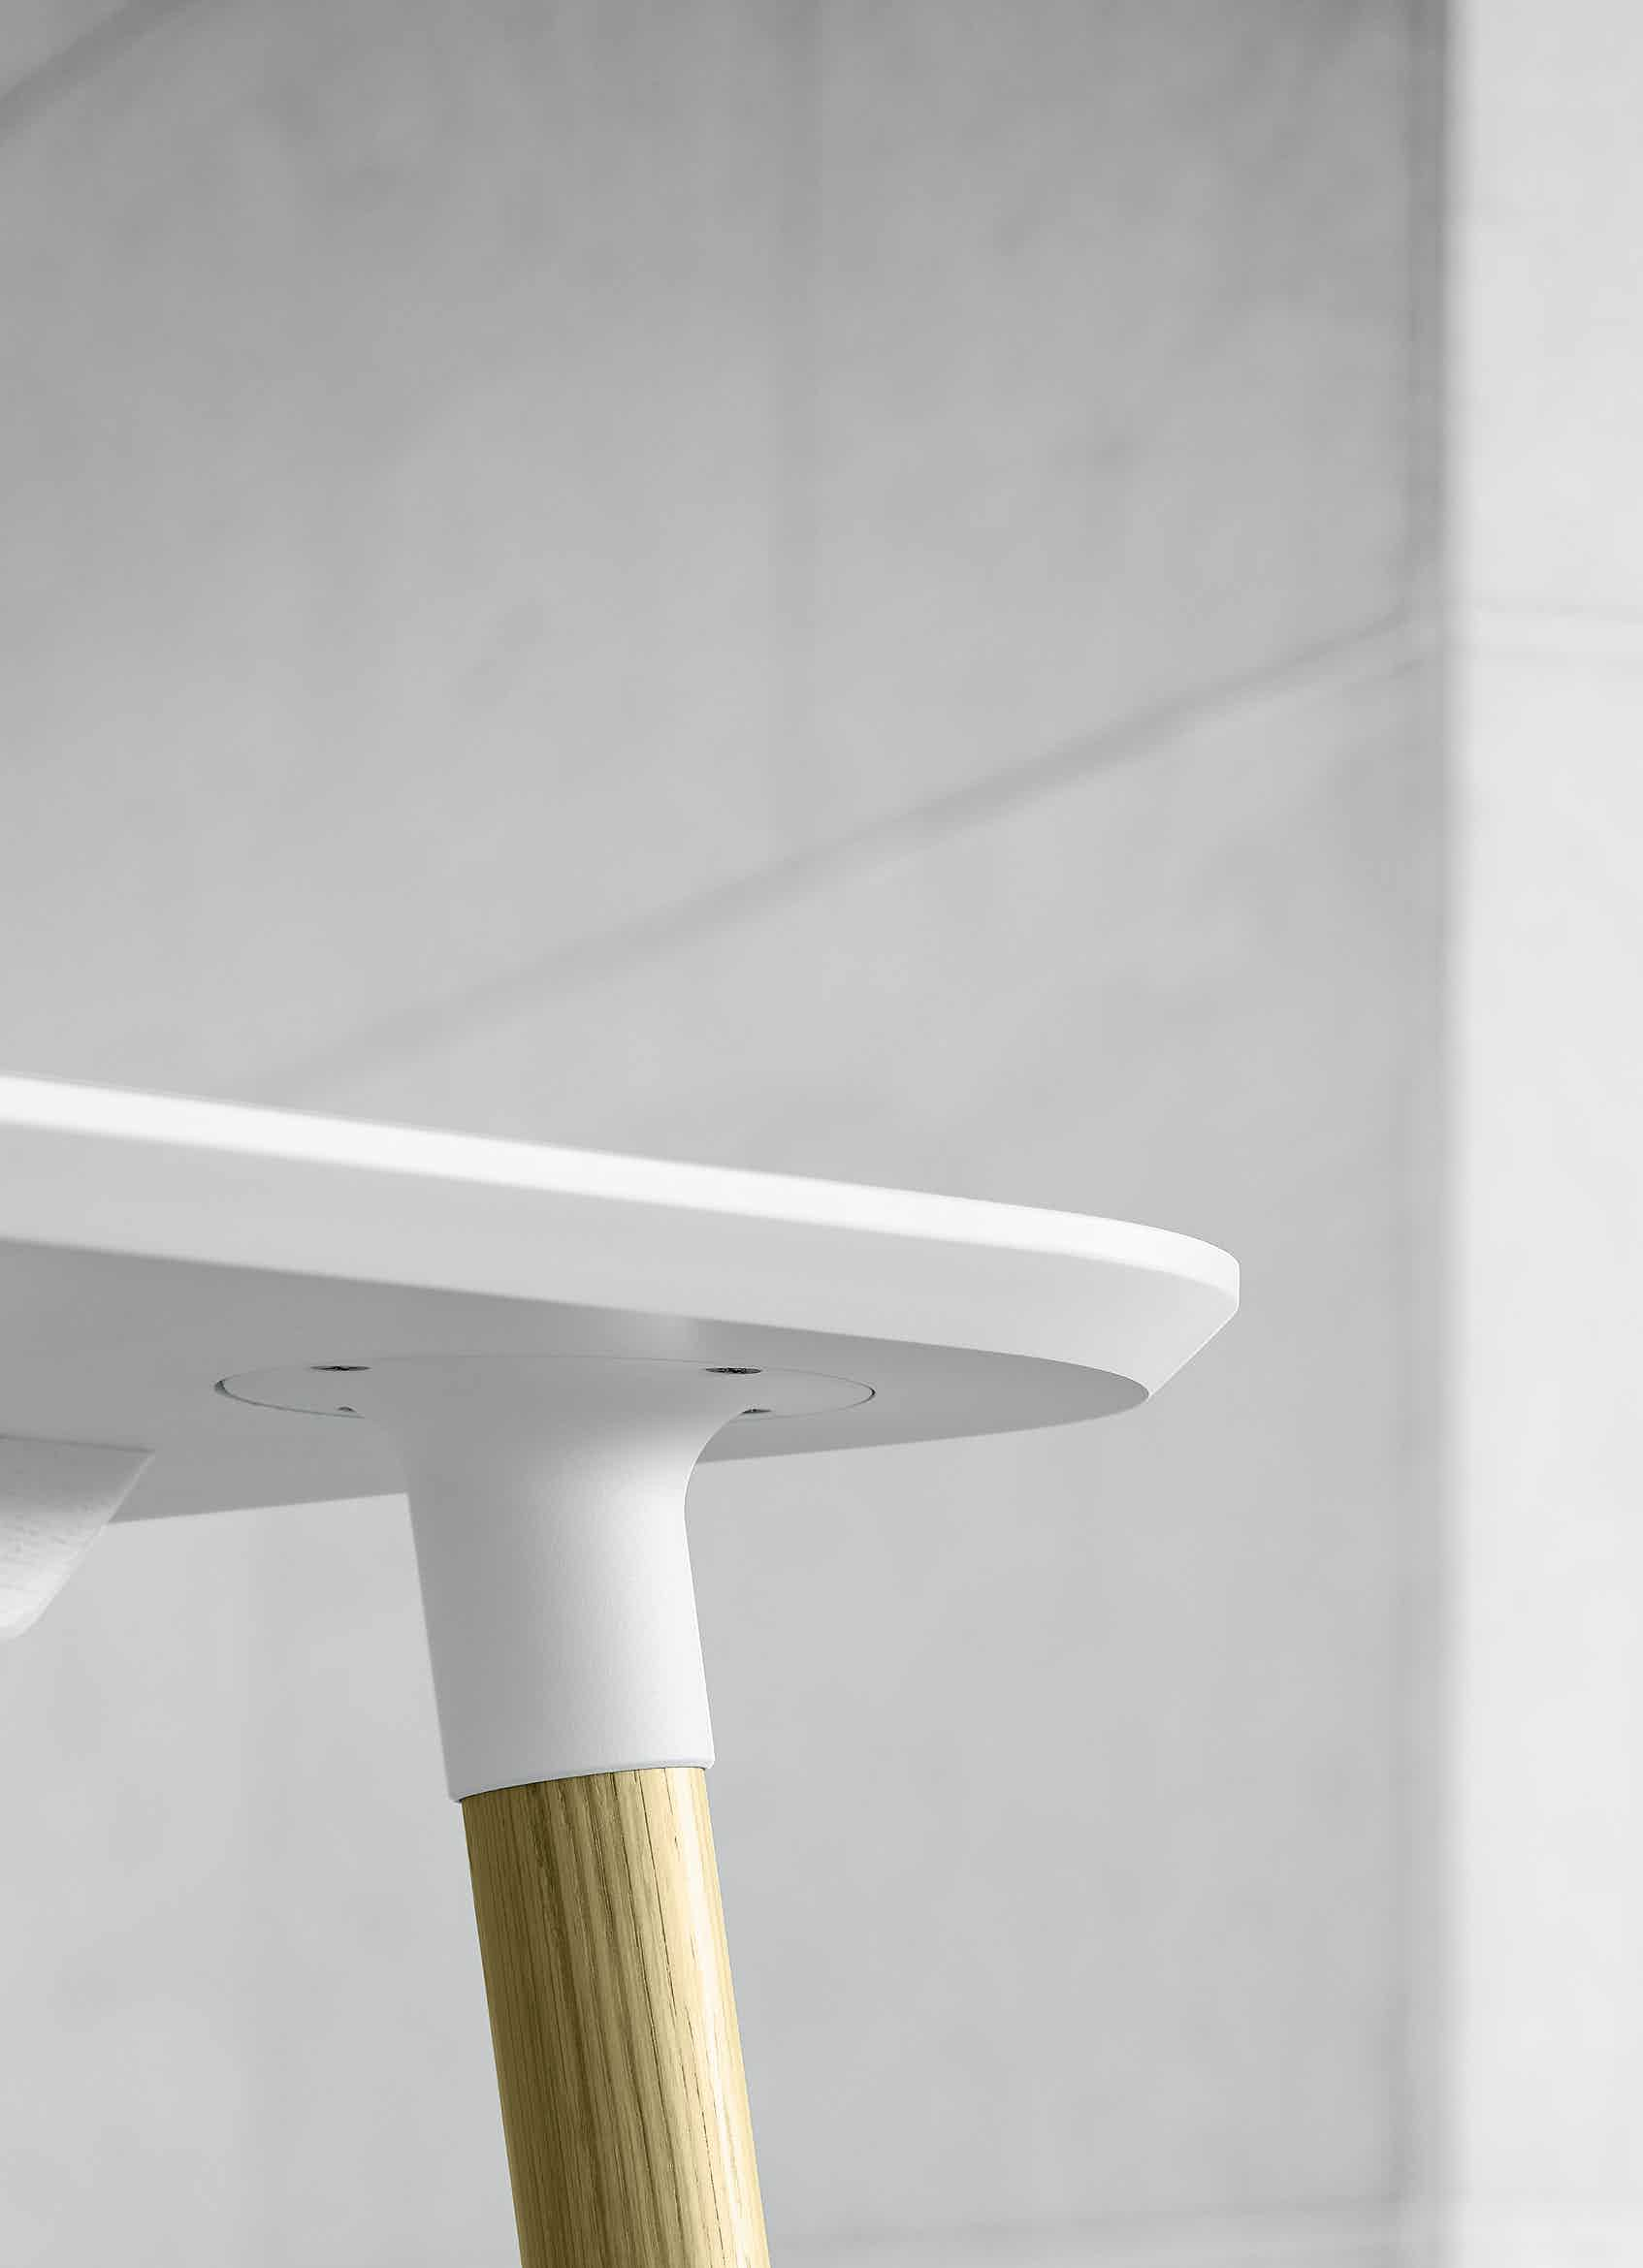 Carl-hansen-son-white-detail-preludia-institu-haute-living